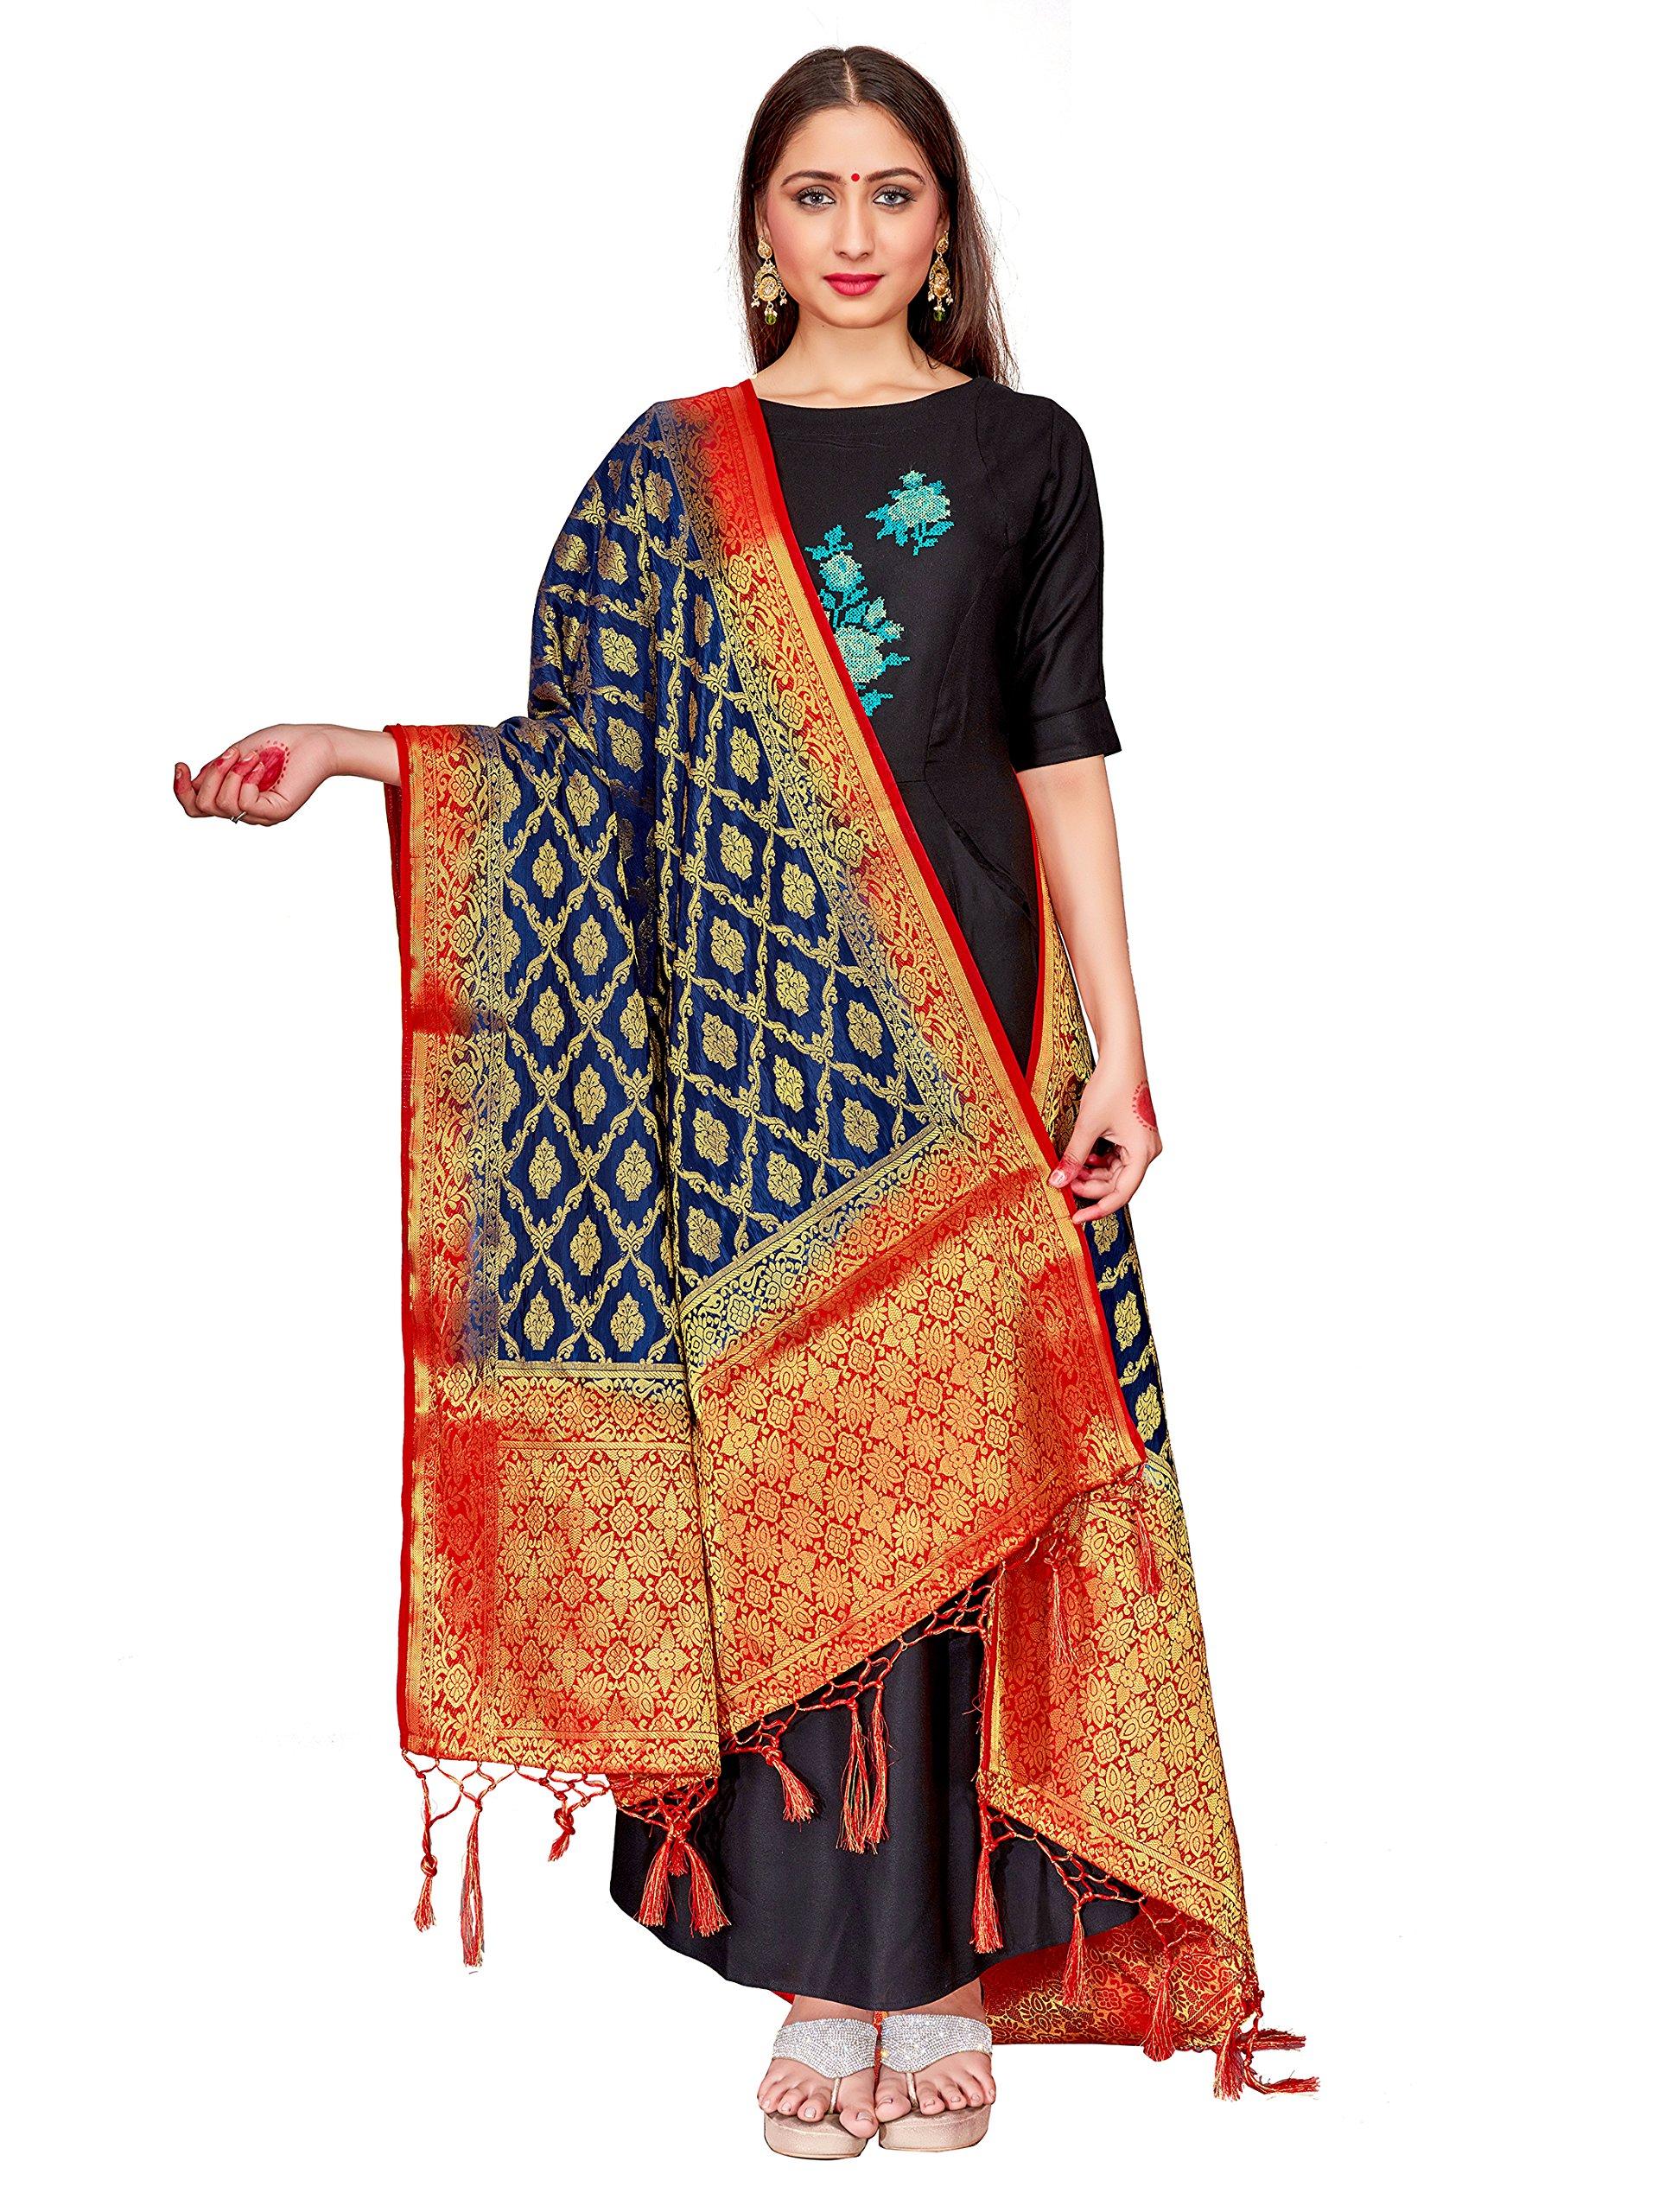 ELINA FASHION Women's Zari Work Indian Banarasi Art Silk Woven Only Dupatta Dress Material & Salwar Suit (Navy Blue 1)